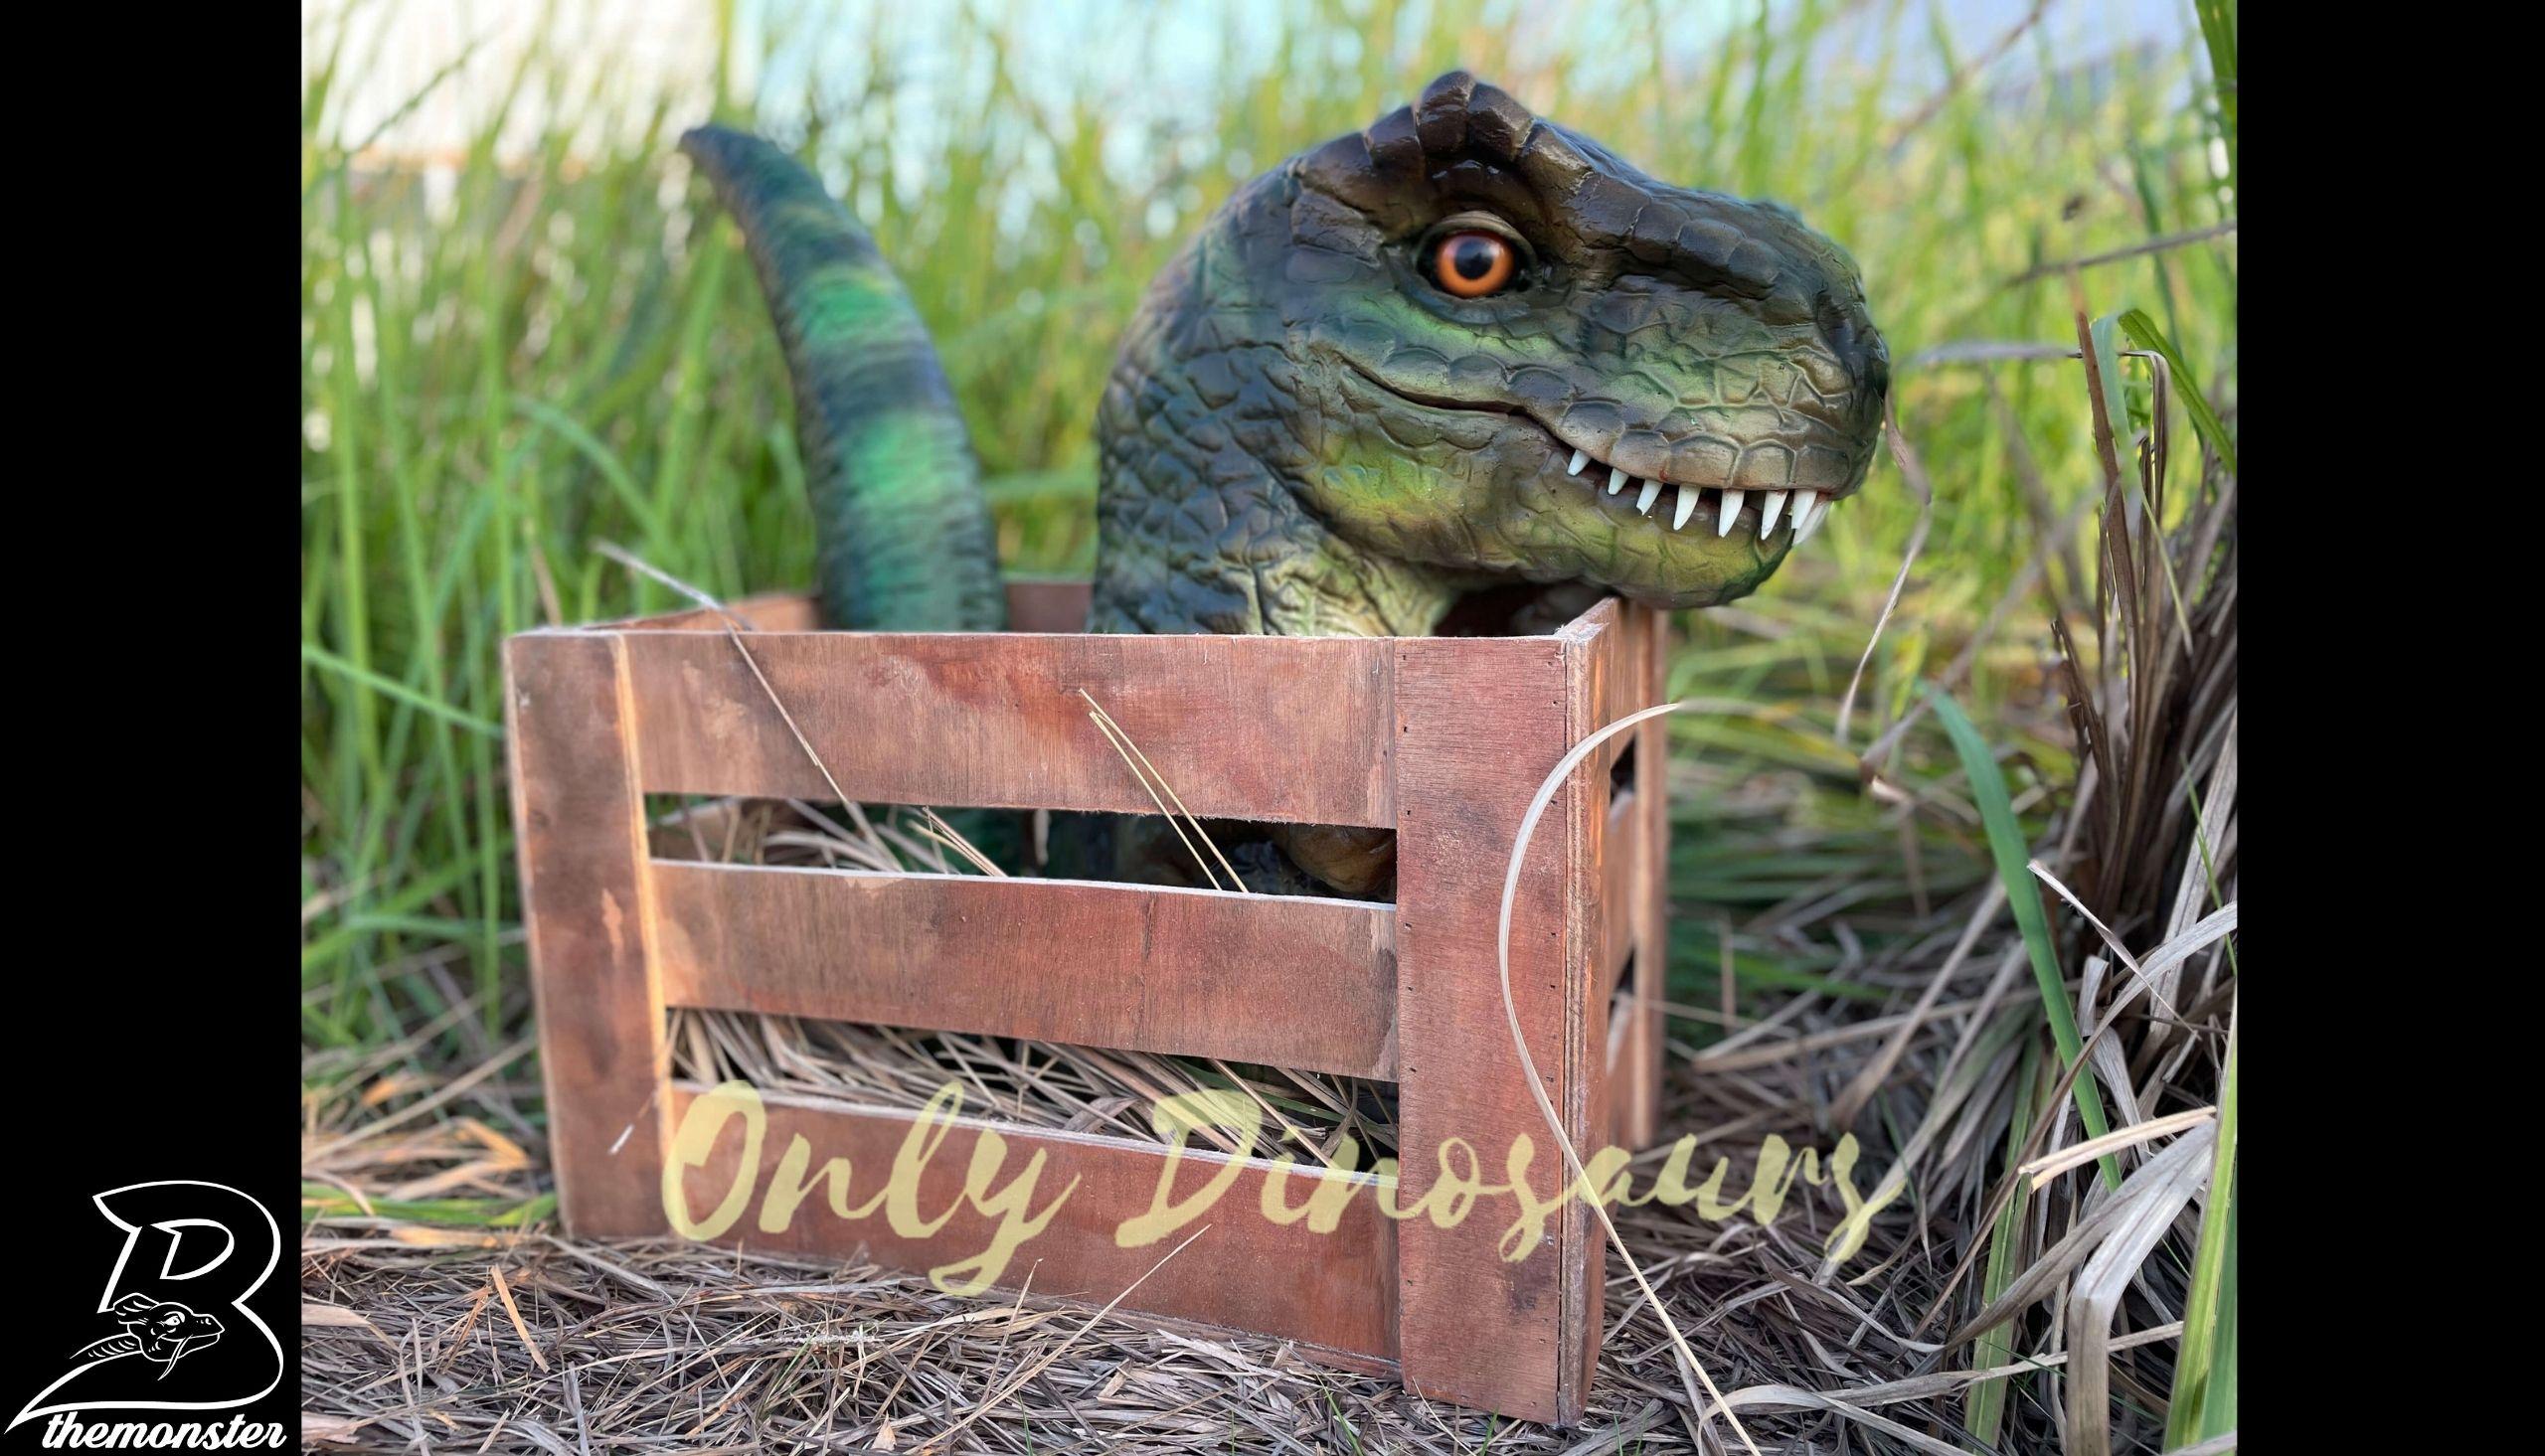 Adorable Crate Baby T-Rex Puppet in vendita sul Bthemonster.com